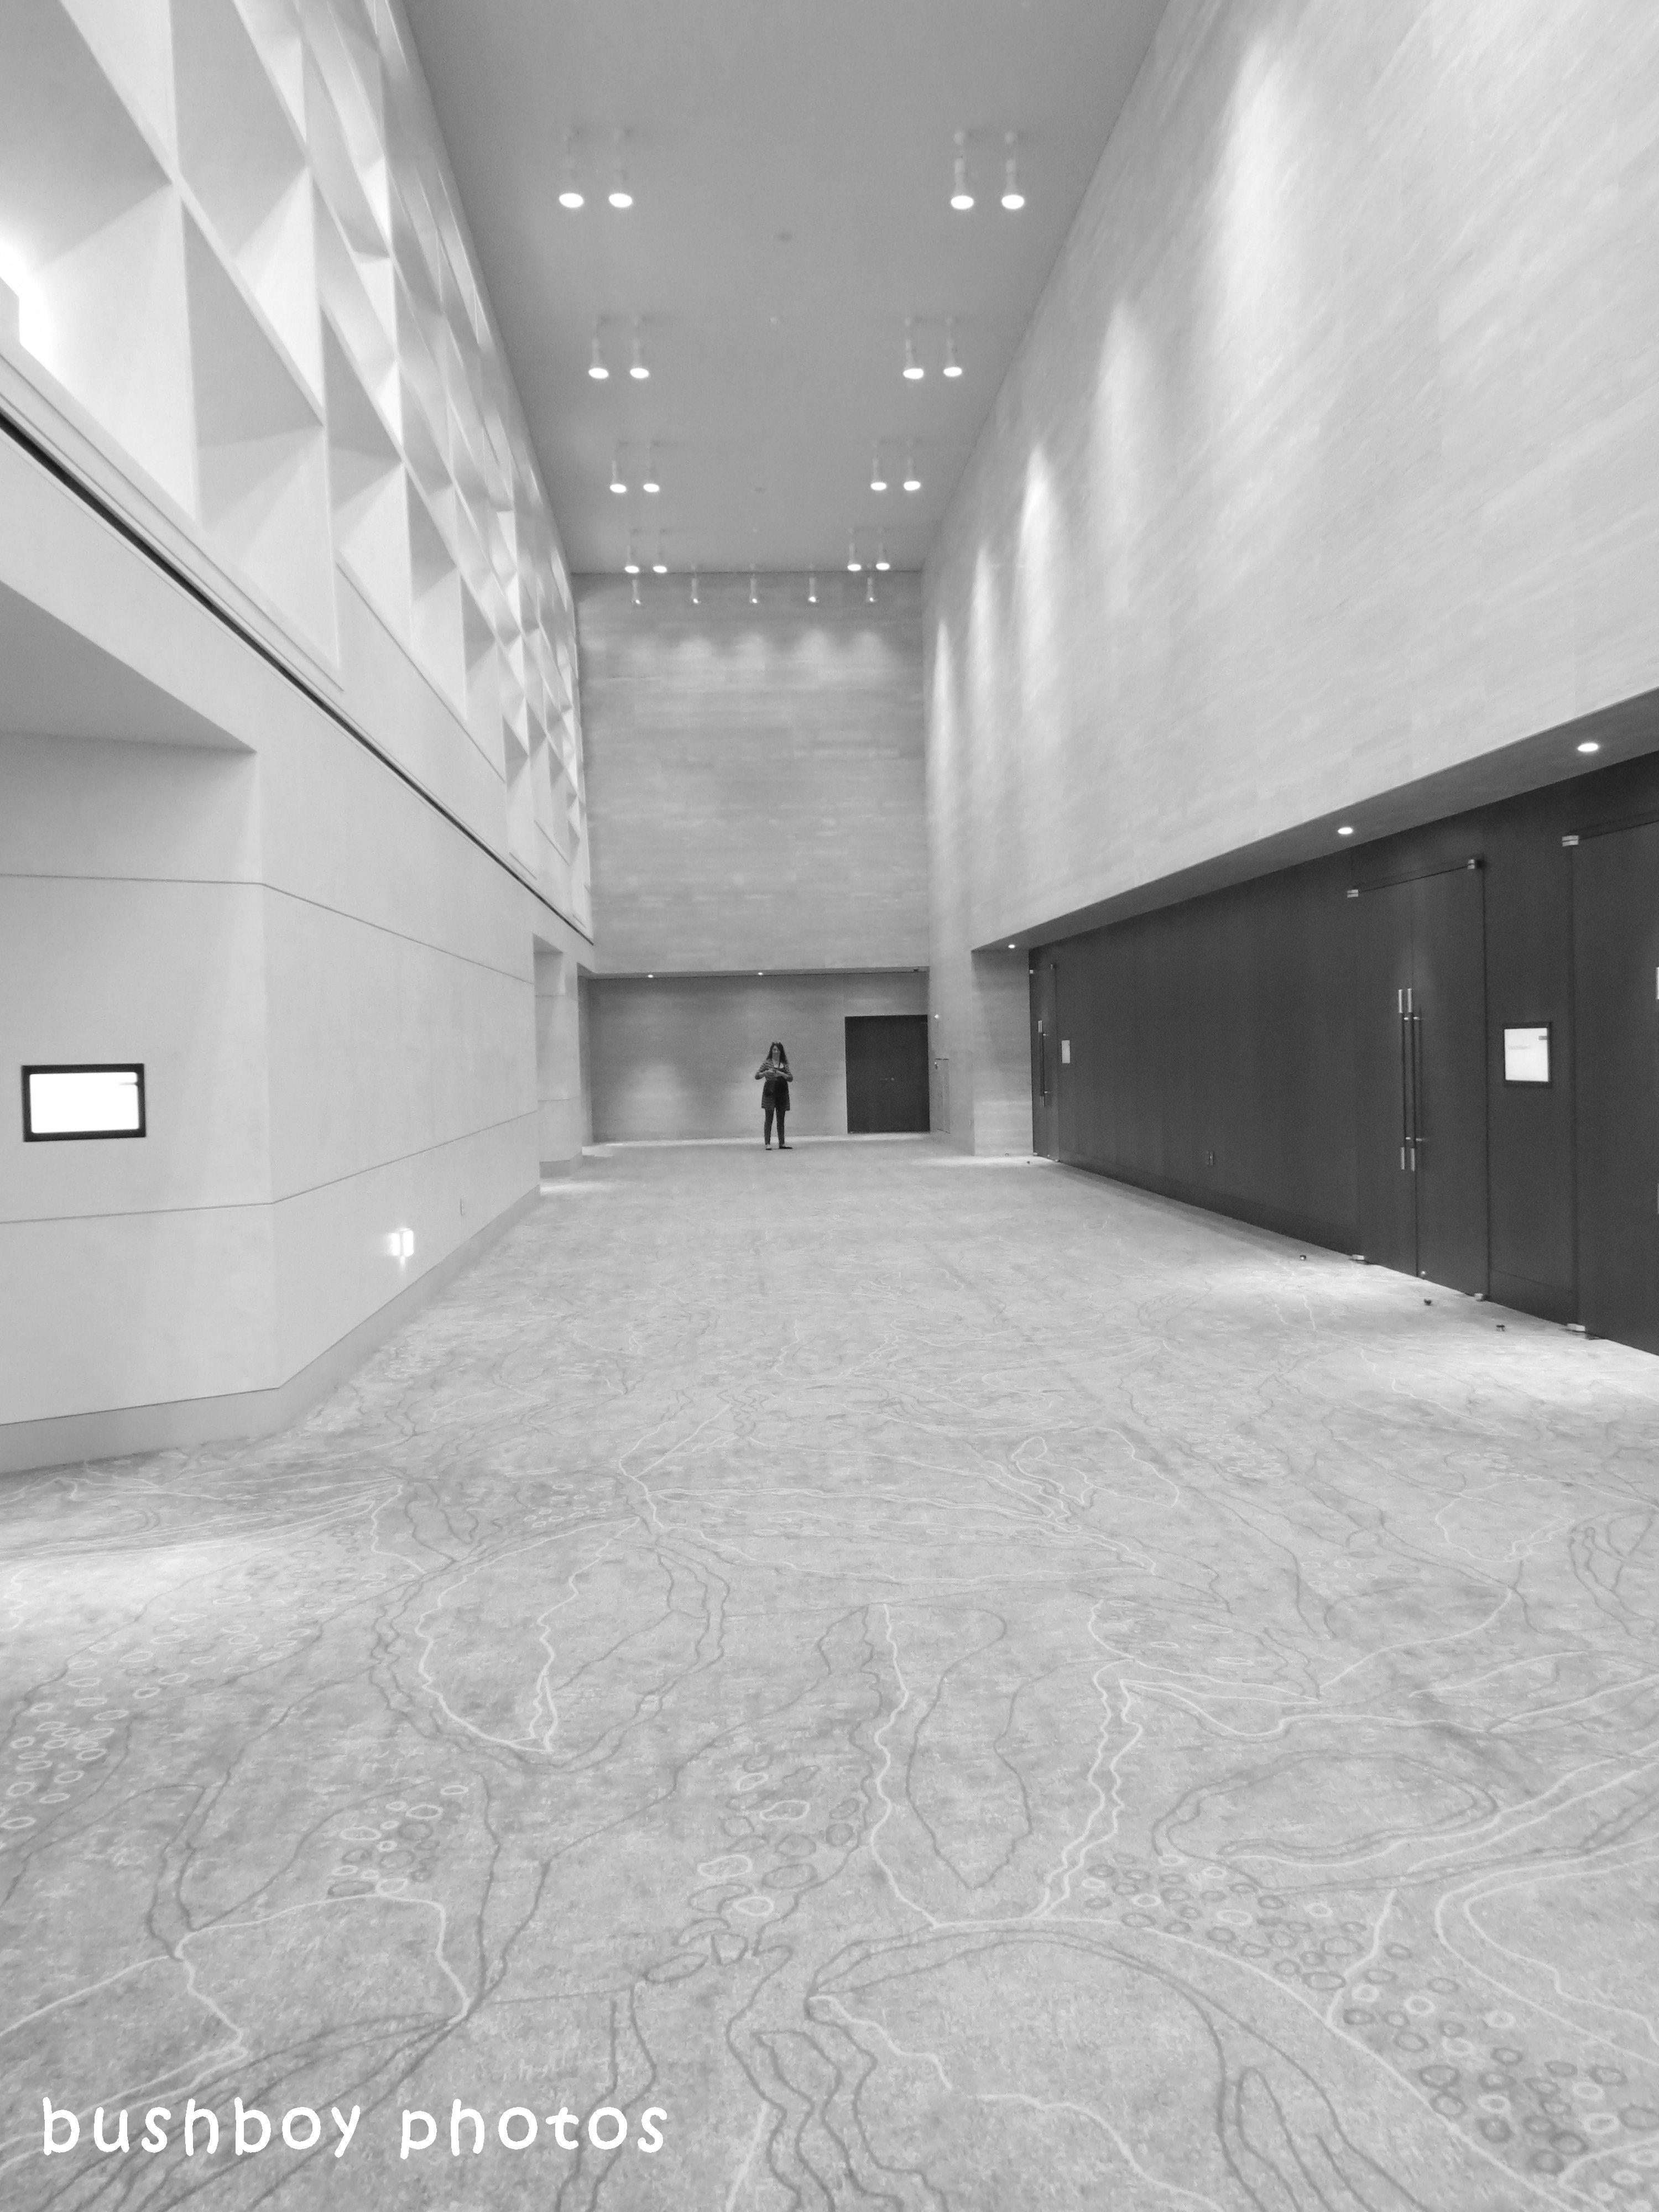 171013_blog challenge_hallways walkways indoor_grand hyatt03_seoul